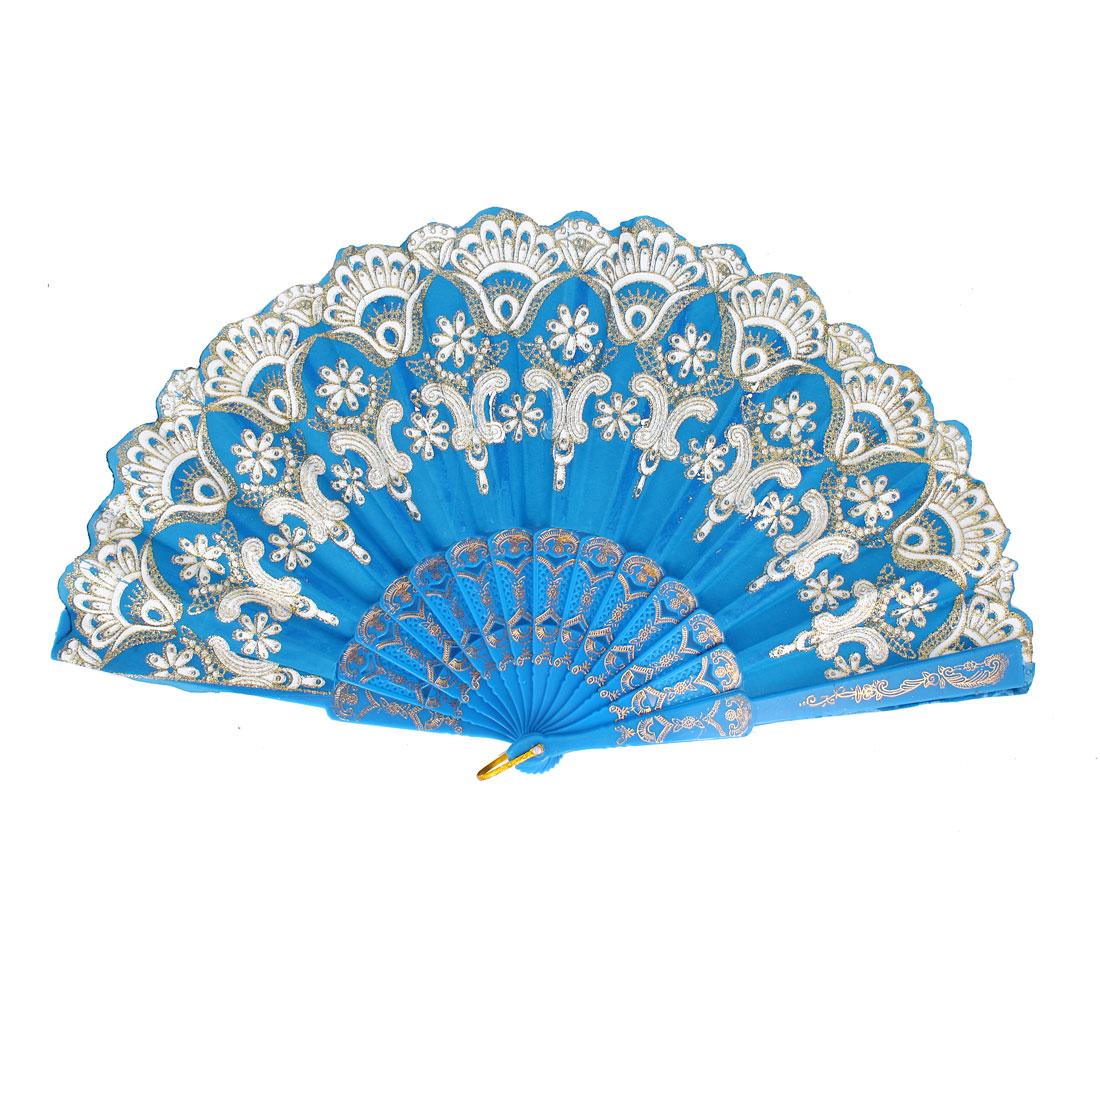 Chinese Style Bling Flower Pattern Party Dance Wedding Folding Hand Fan Blue